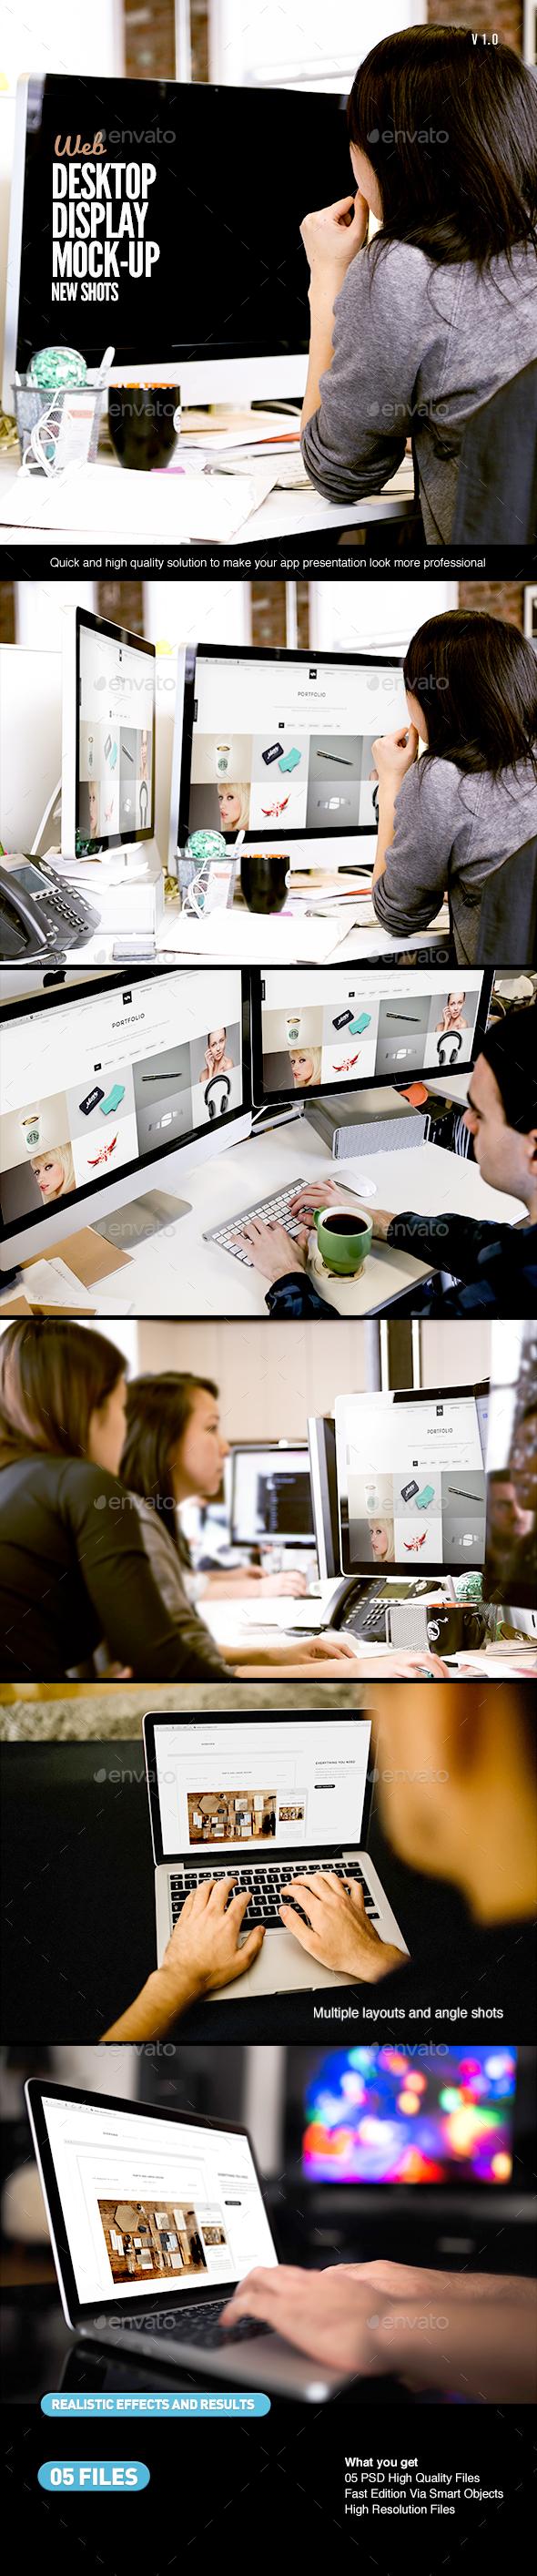 Desktop Screen Work Display Mock-Up (Displays)